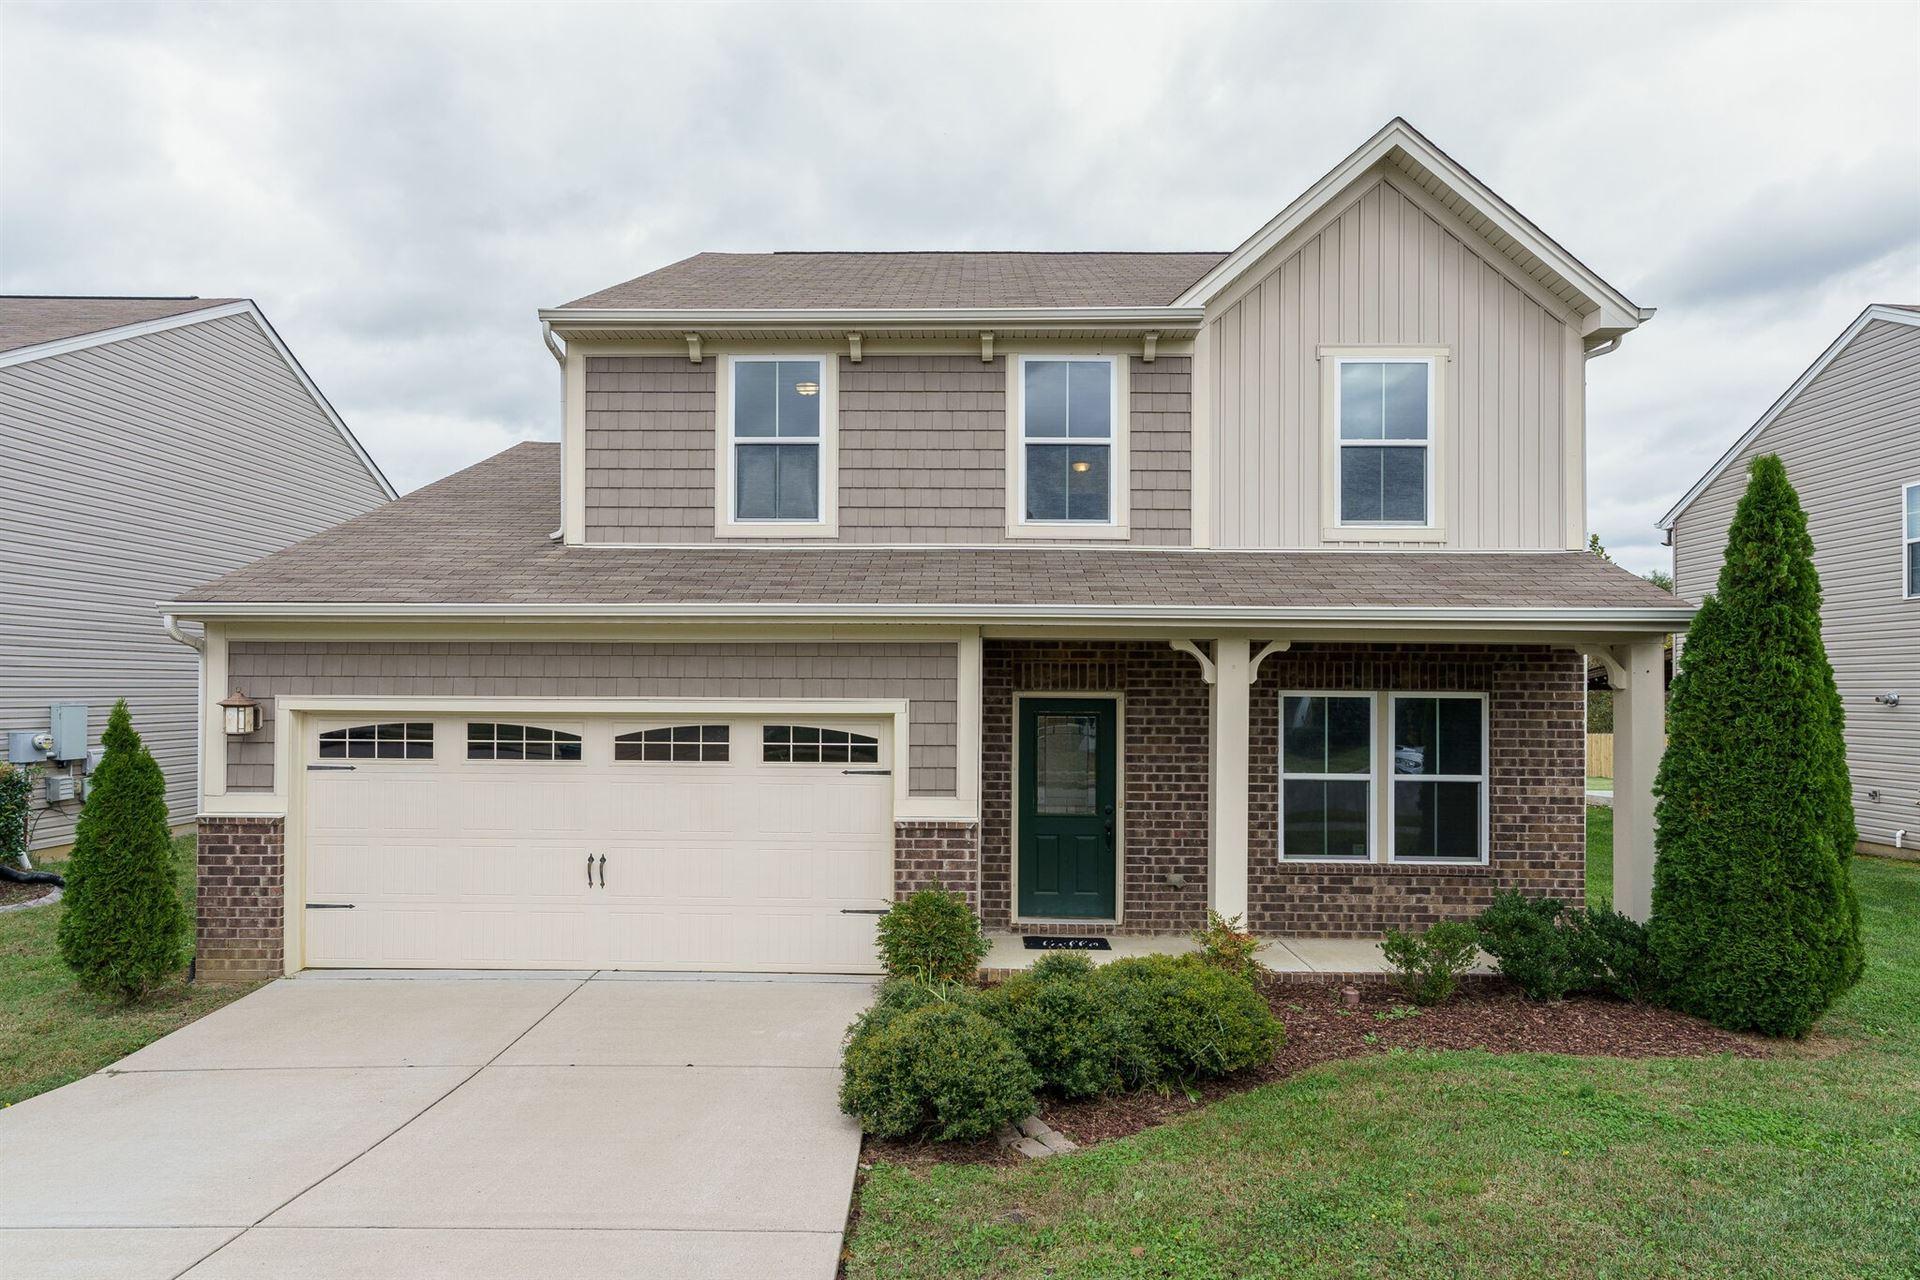 1260 Scarcroft Ln, Nashville, TN 37221 - MLS#: 2302657